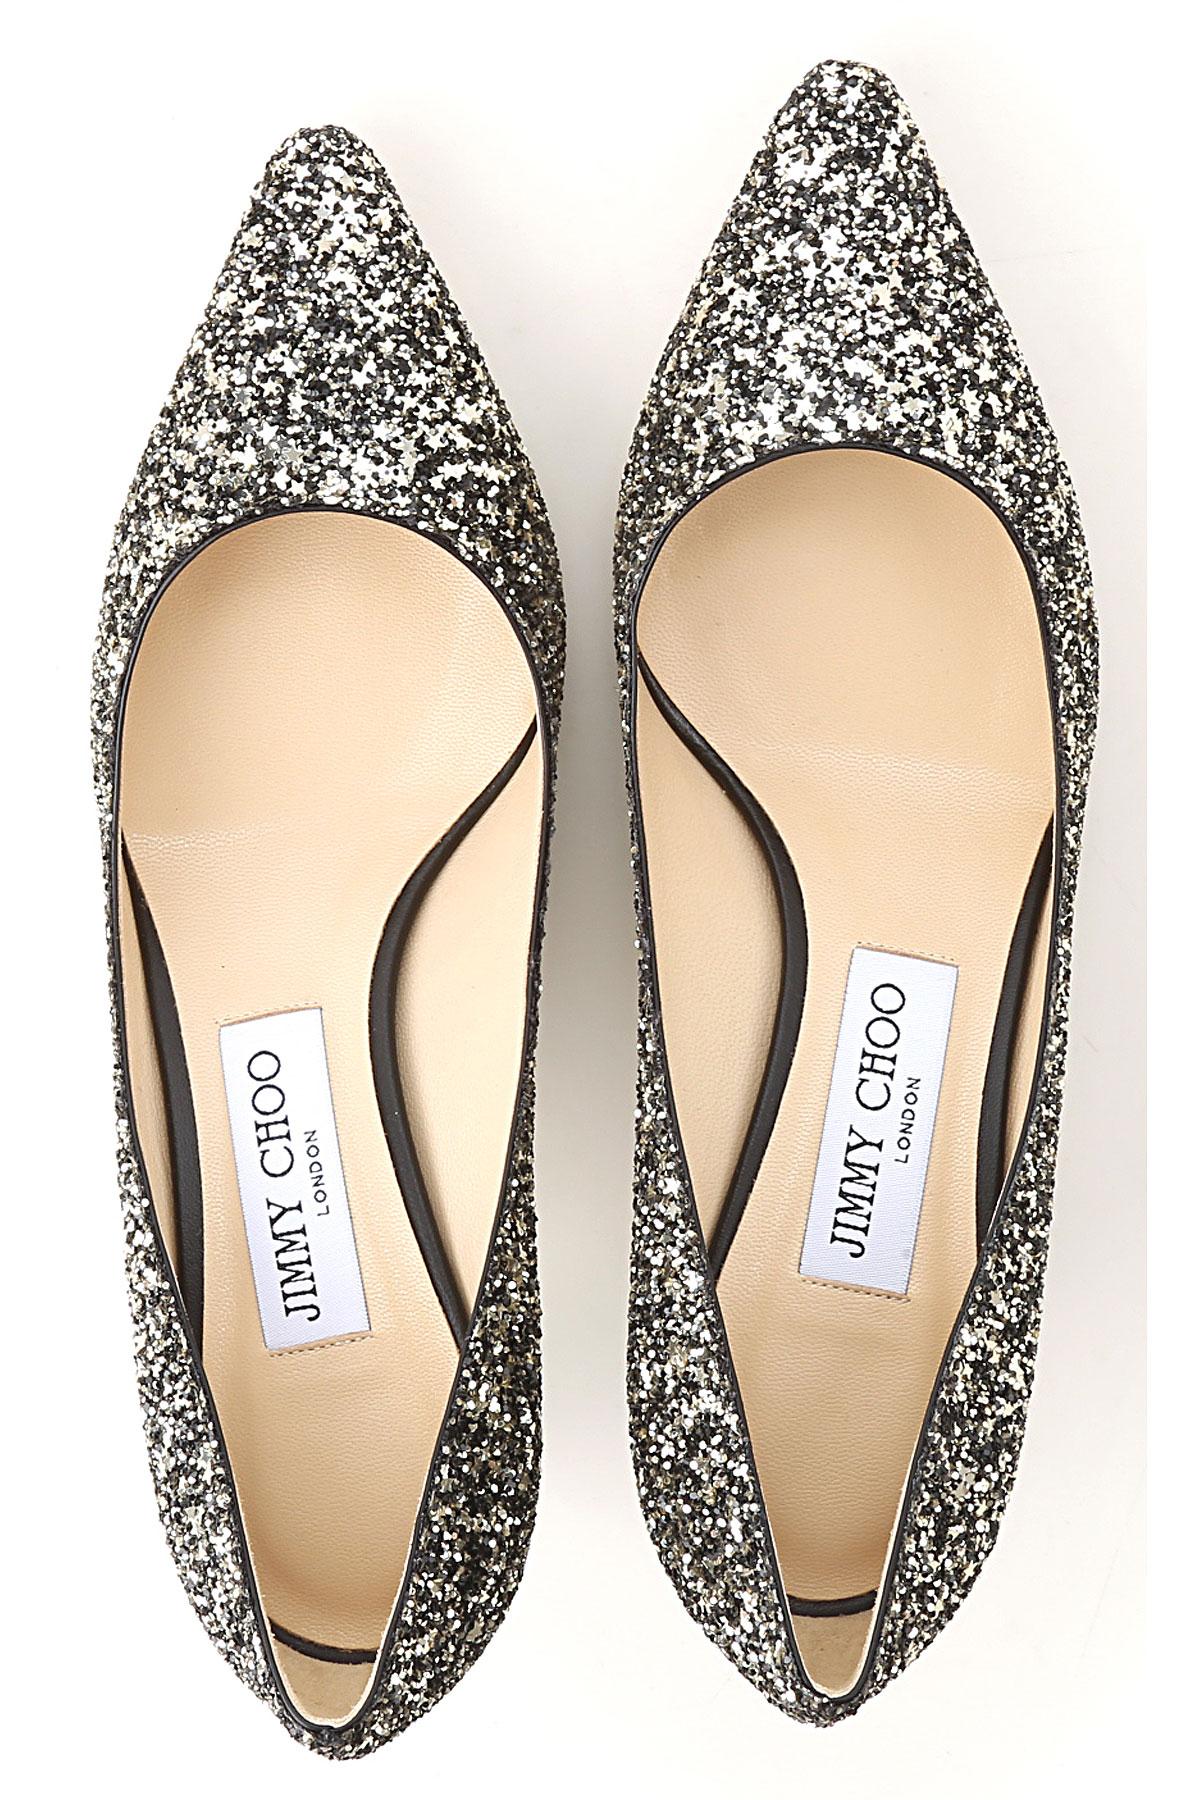 2019 Mujer verano dorado Brillantoso Jimmy Choo Para Zapatos Oro Negro Primavera vcAWpqY8f